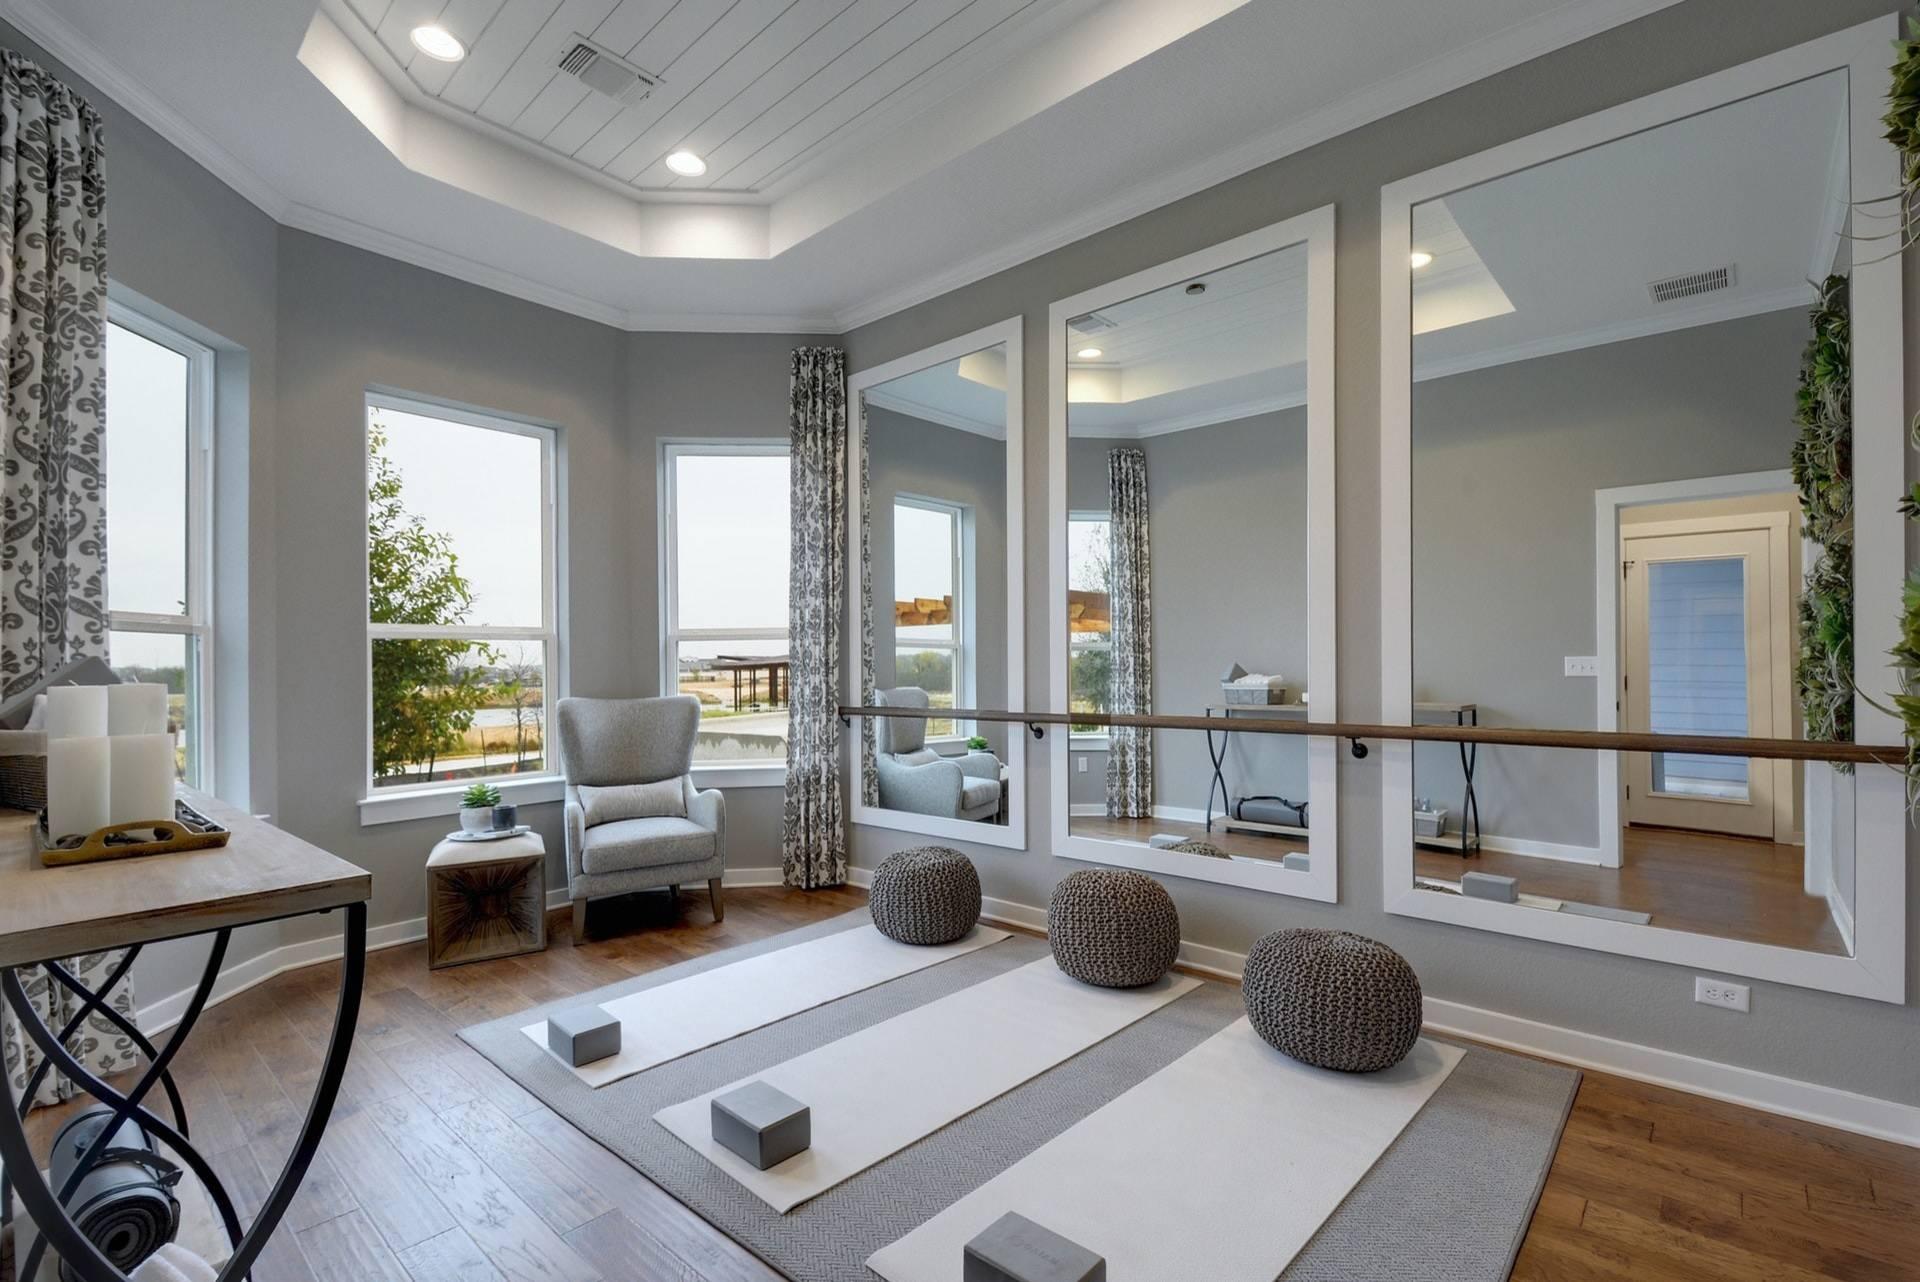 75 Beautiful Home Yoga Studio Pictures Ideas December 2020 Houzz